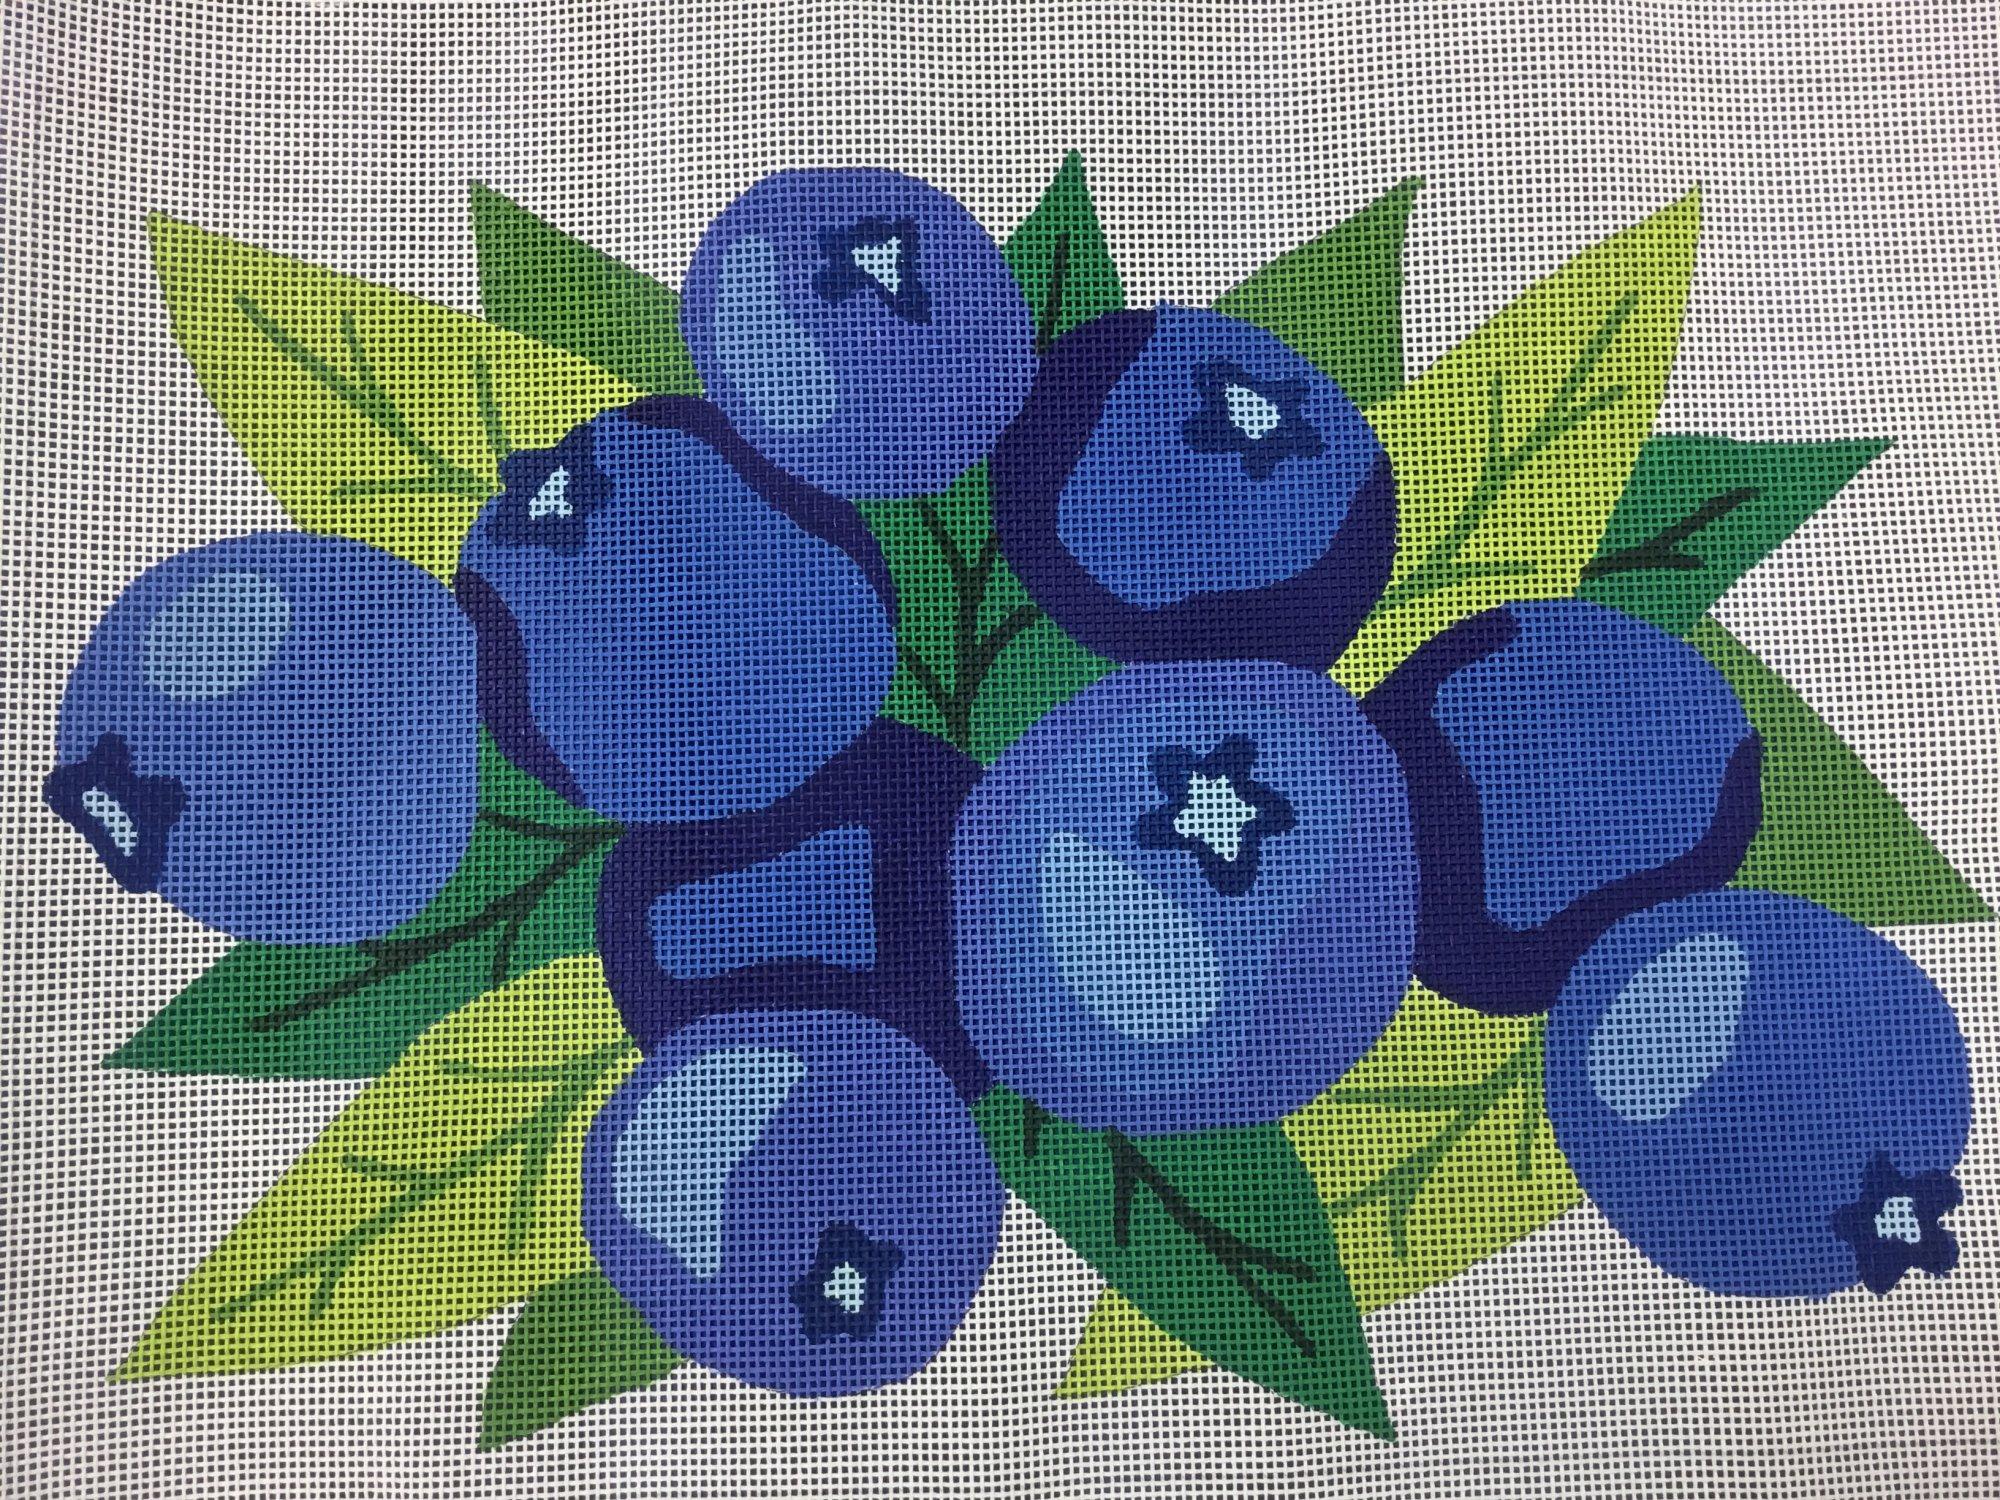 Blueberries,13 ct.,12x17 1/2